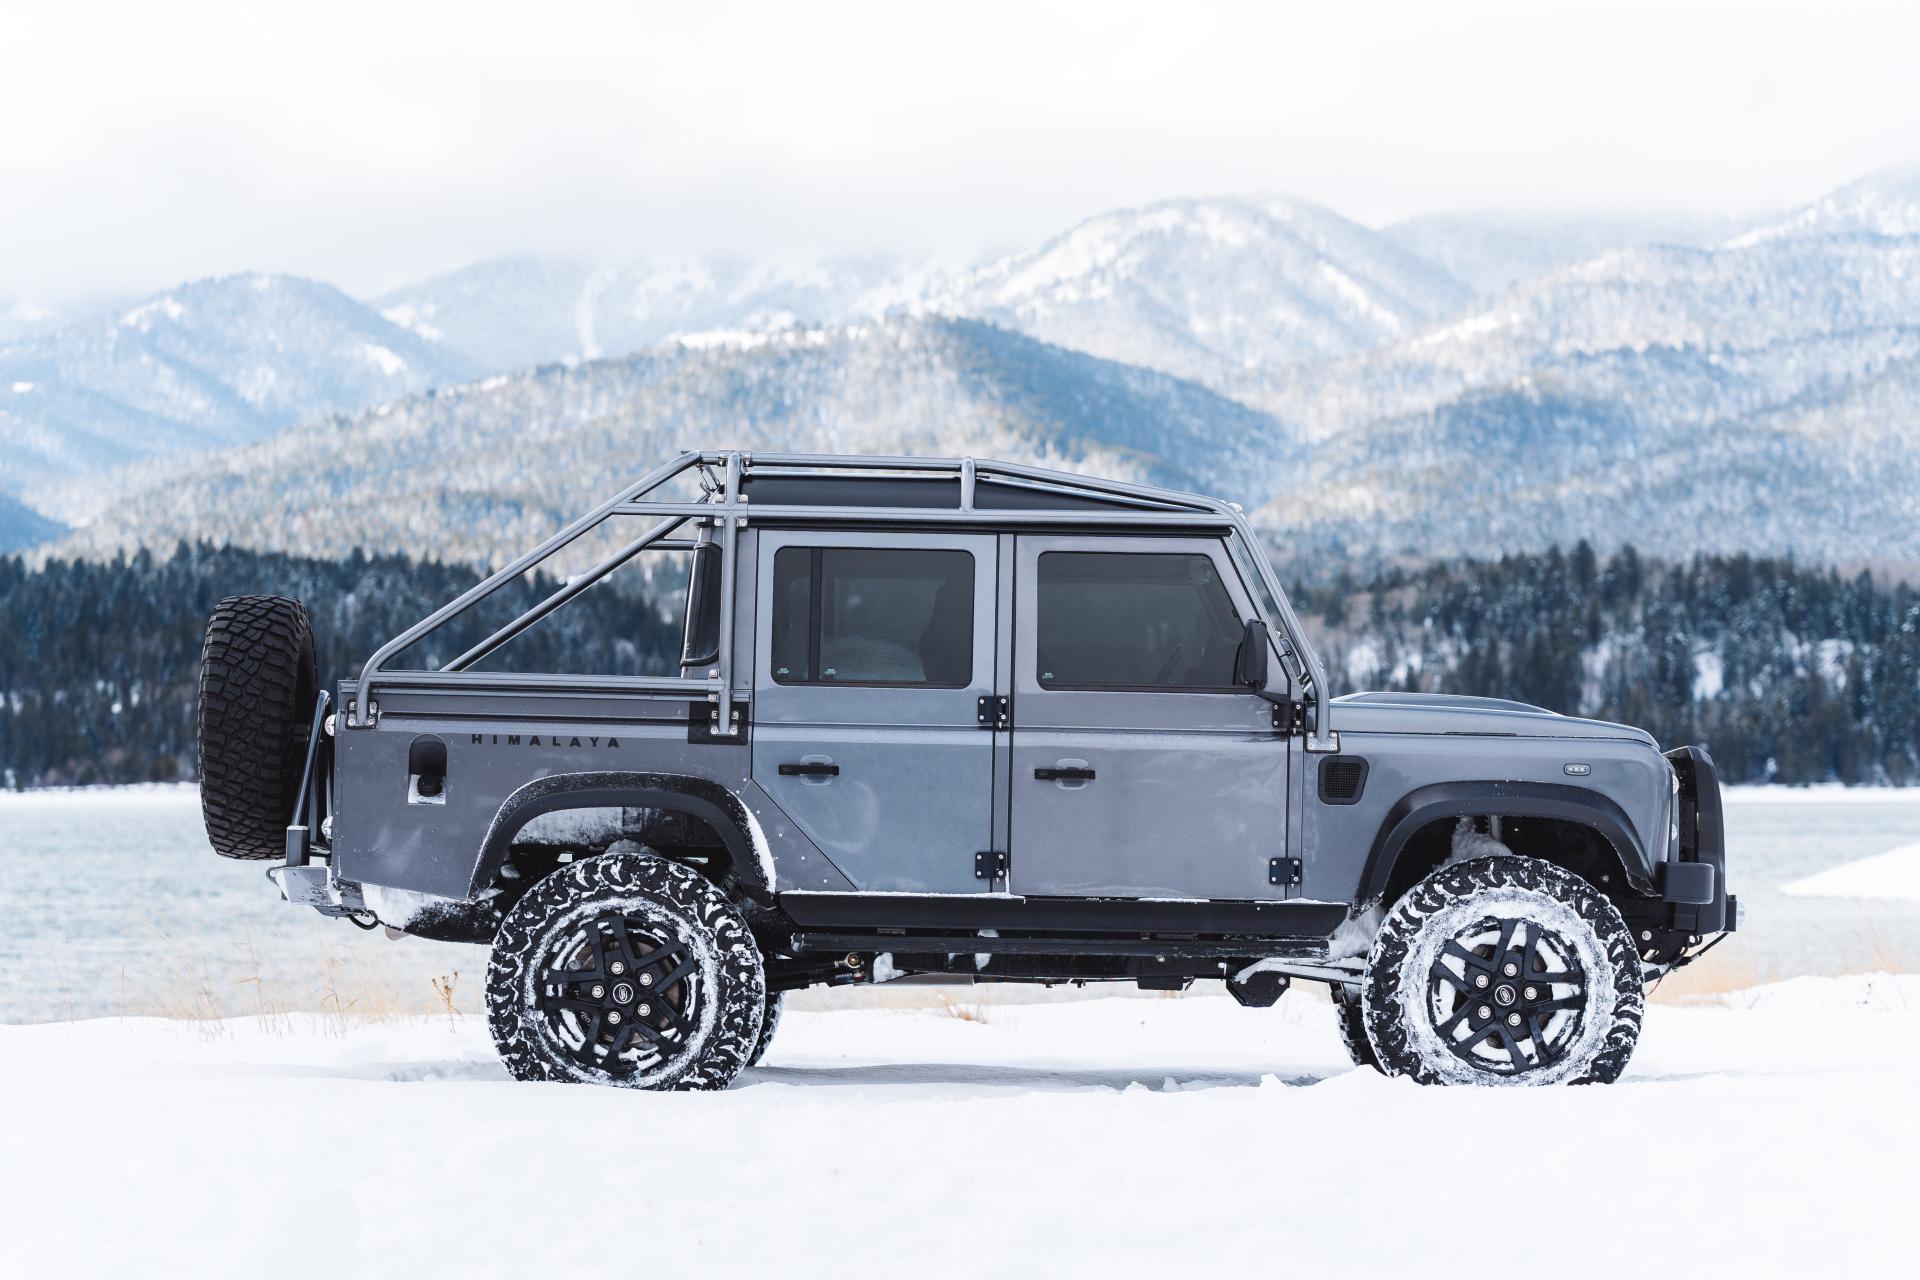 Land_Rover_Defender_by_Himalaya_0015